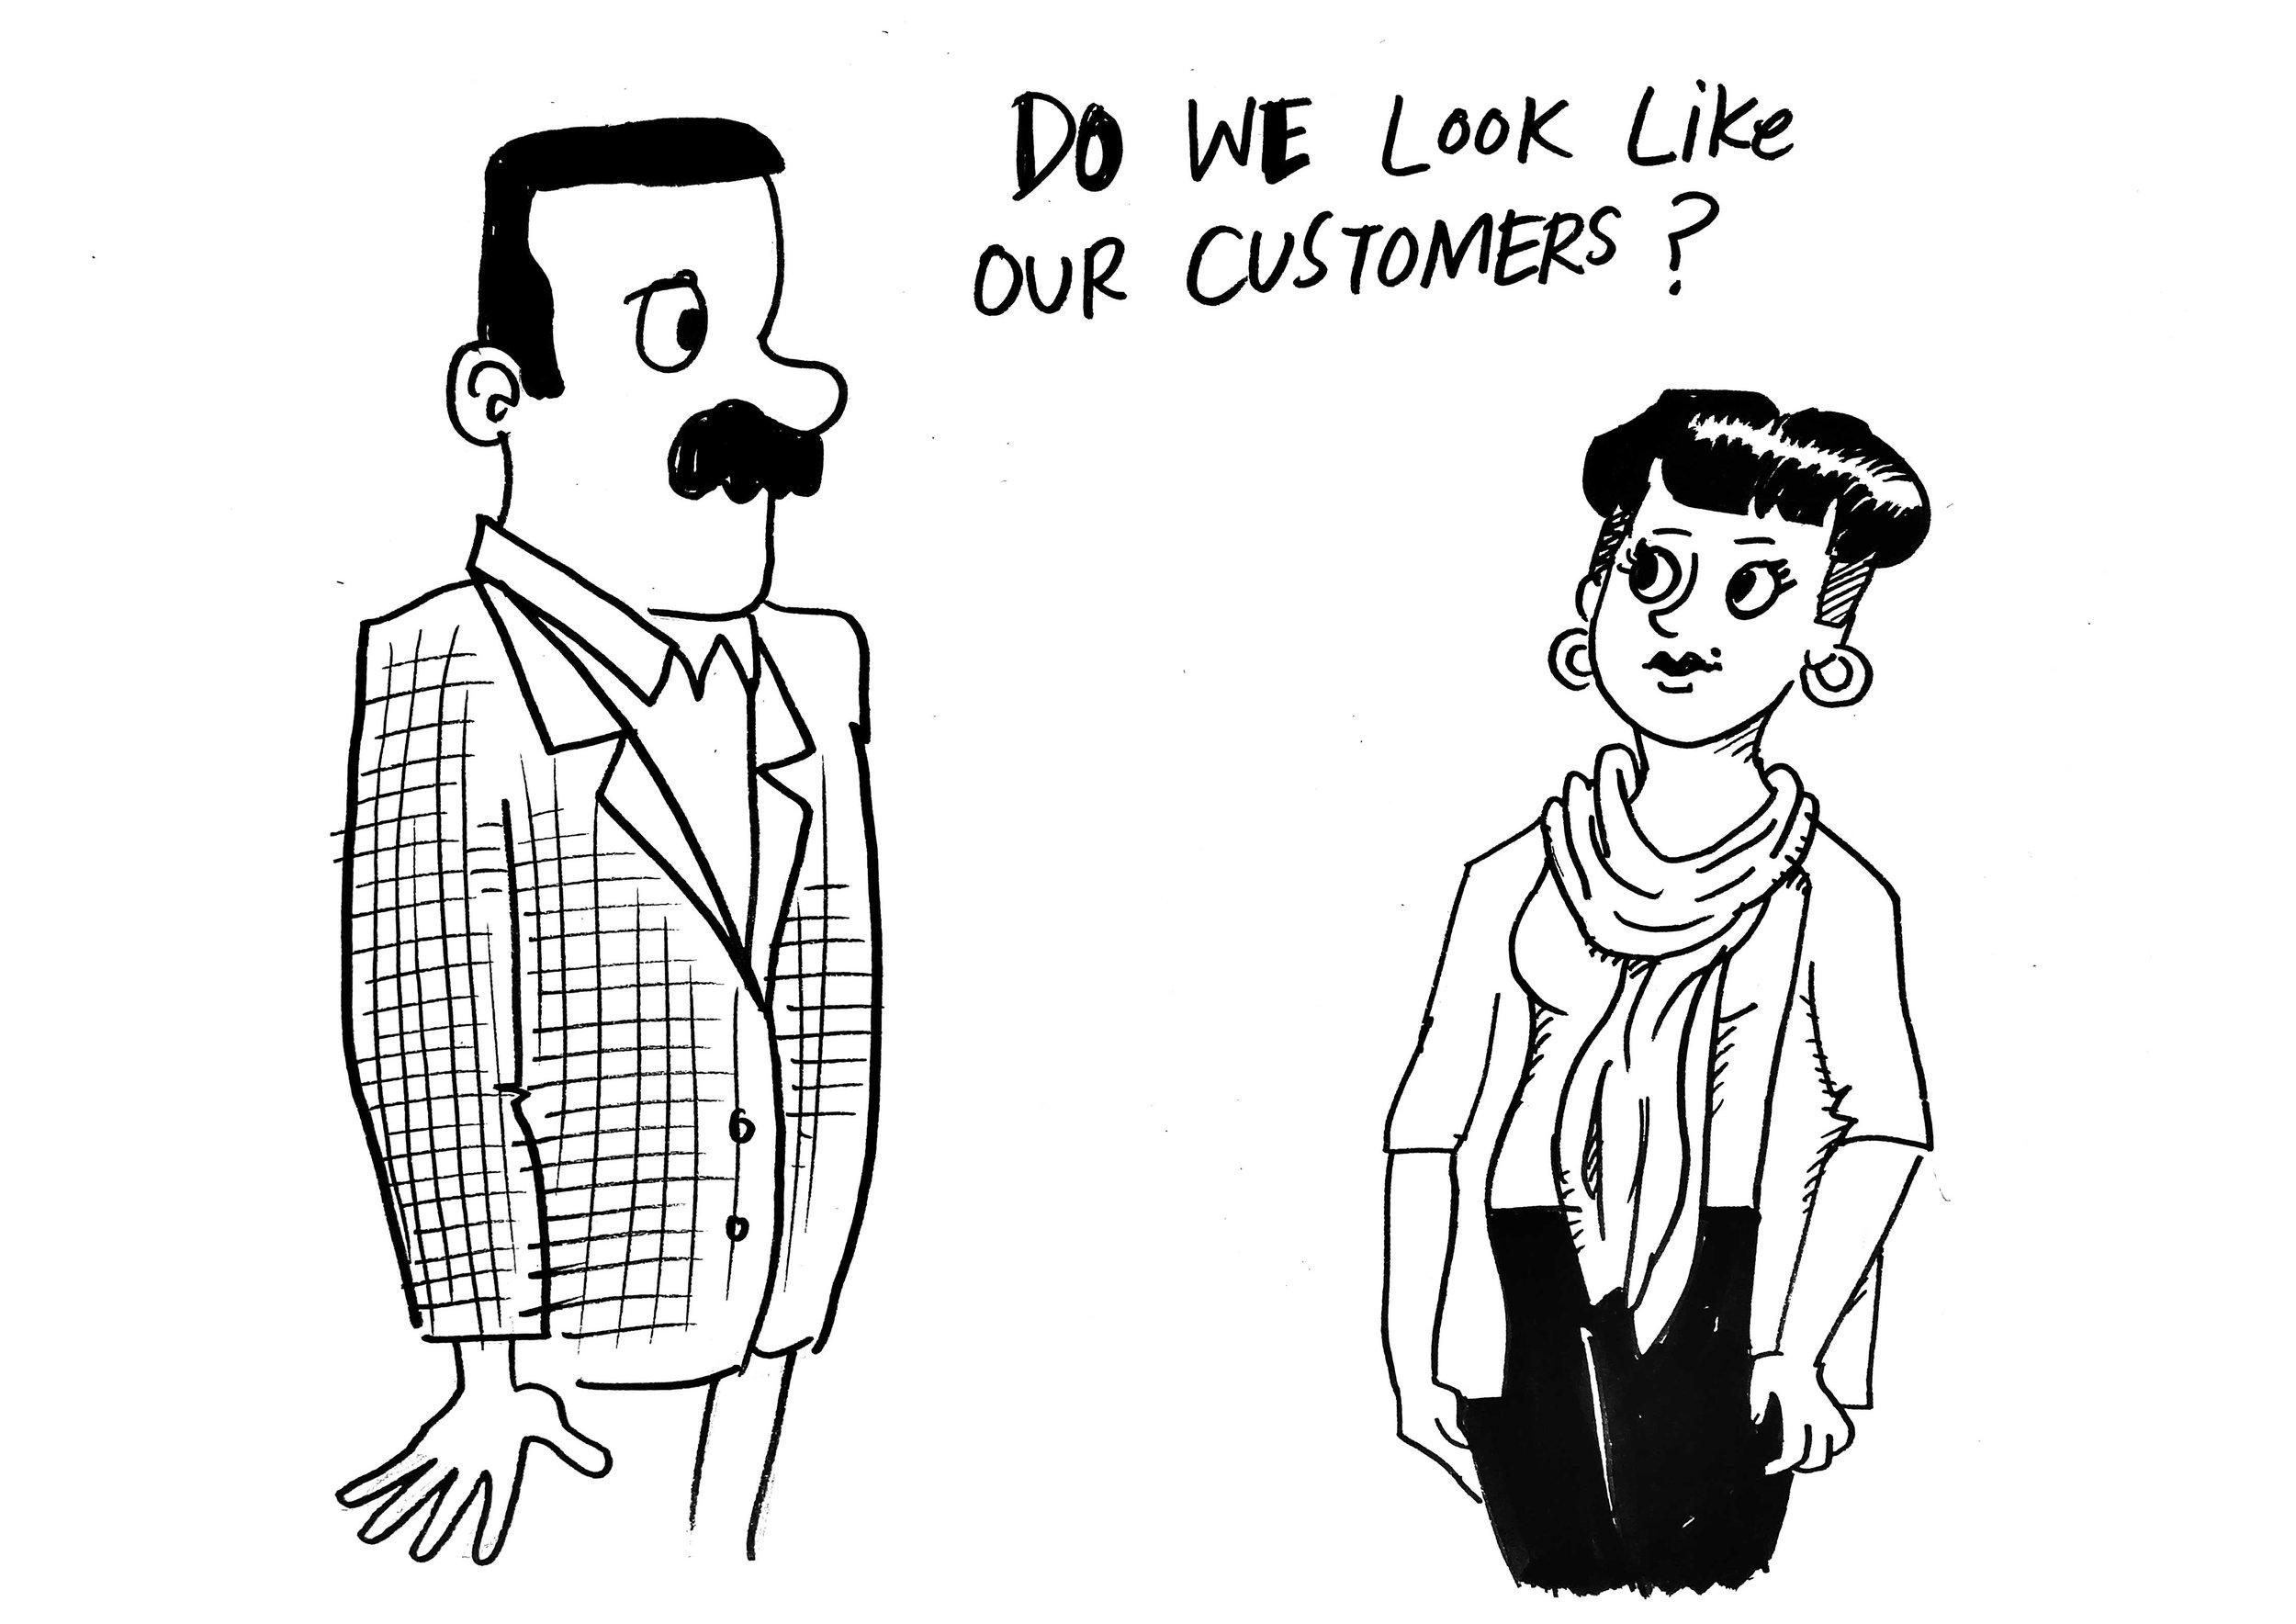 do-we-look-like-customers.jpg